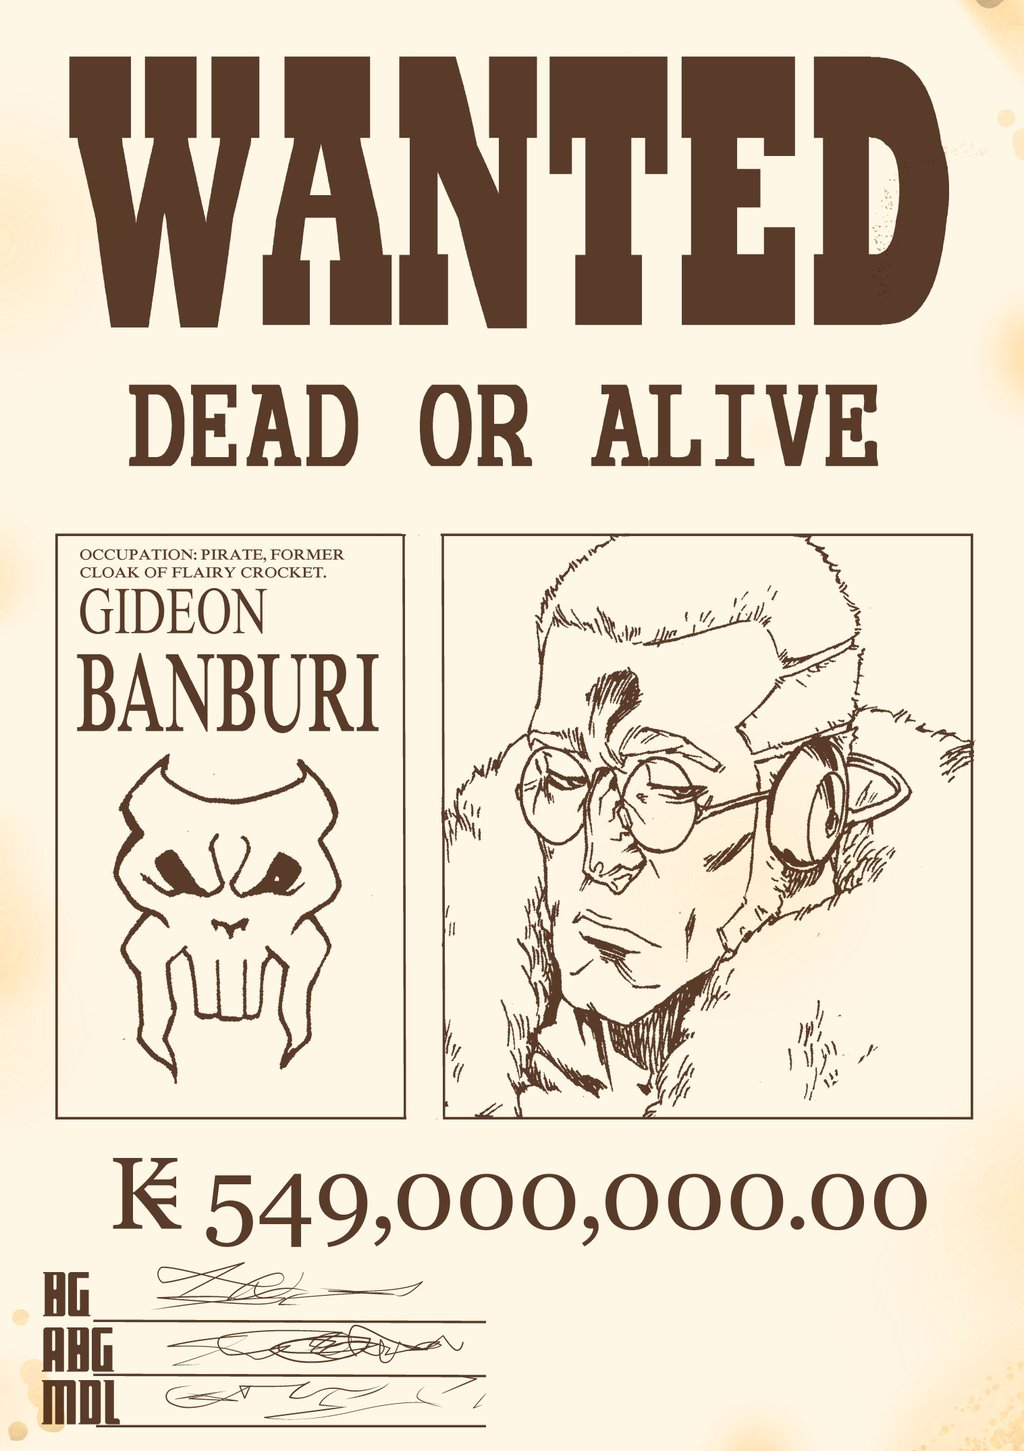 Gideon Banburi Wanted Poster